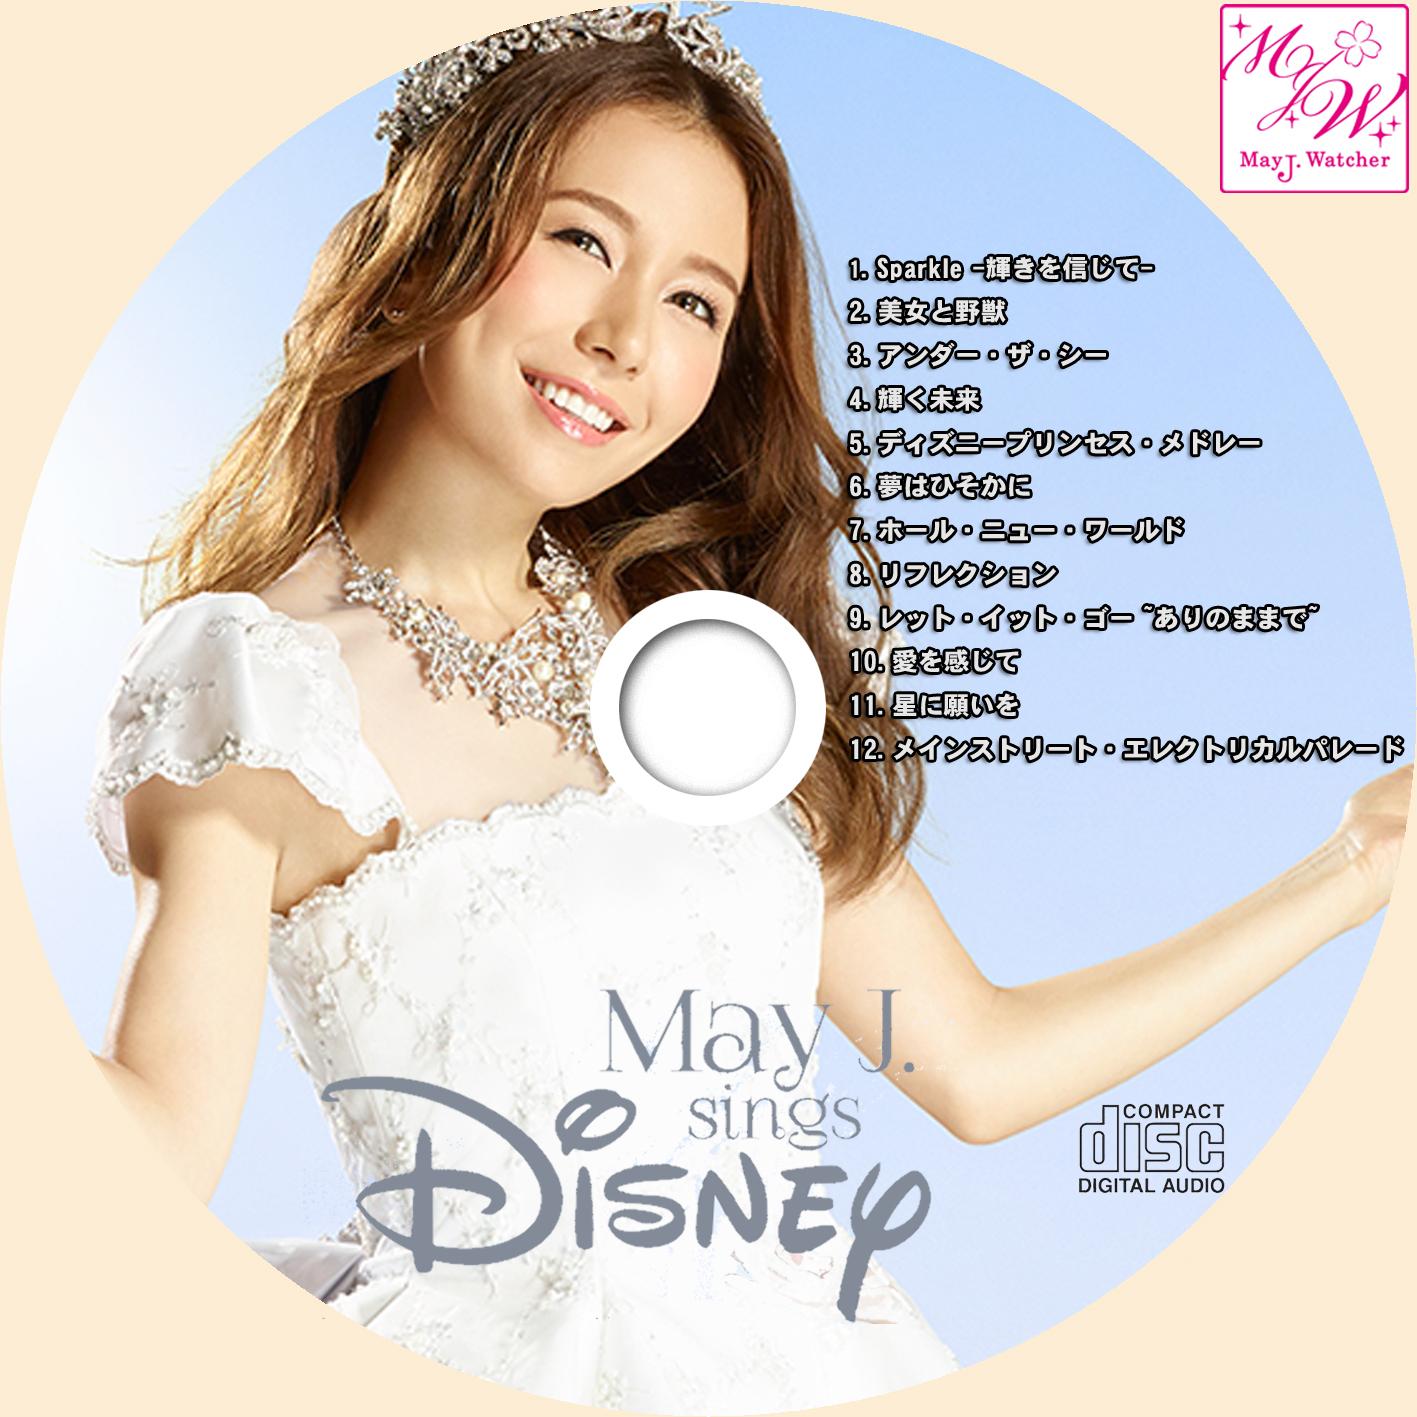 May J. sings Disneyの公式動画 ... : 英語のプリント : プリント